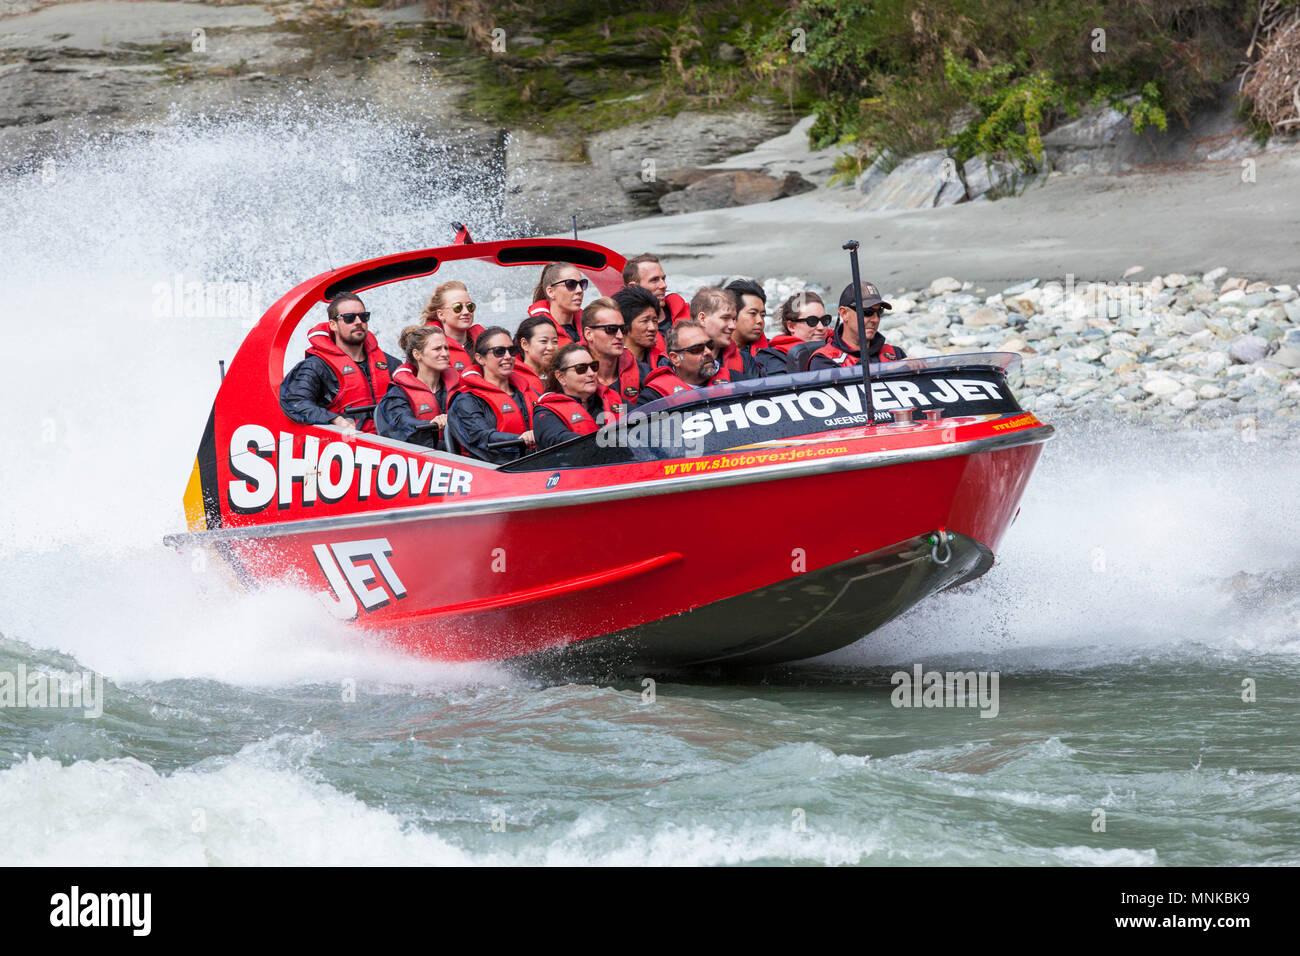 Shotover jet boating sul fiume Shotover vicino a Queenstown gente Nuova Zelanda Nuova Zelanda queenstown Nuova Zelanda Isola del Sud nz Foto Stock